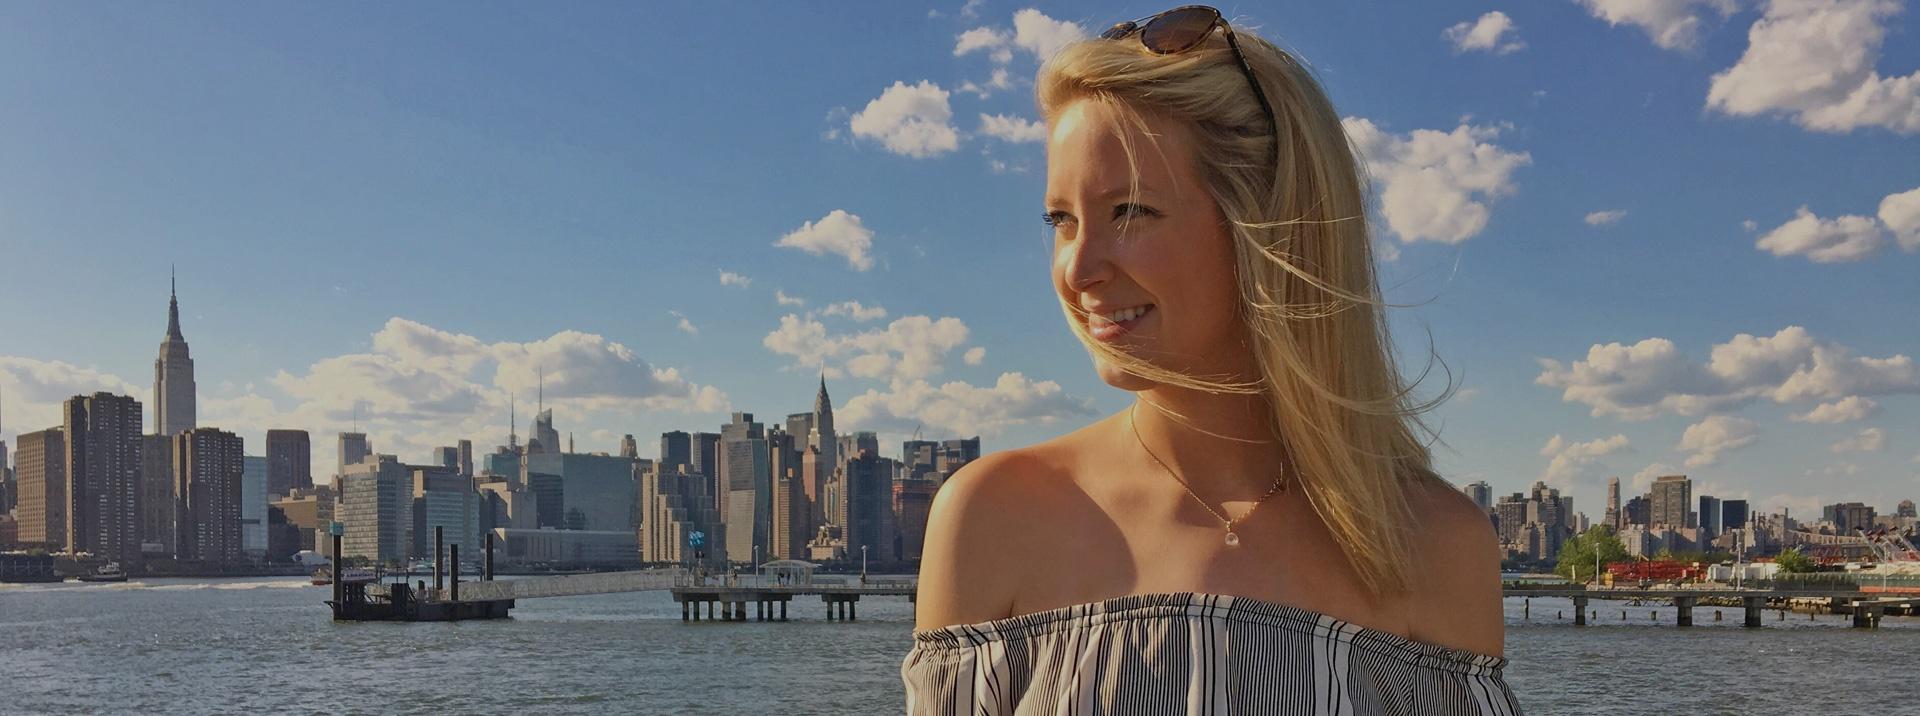 New York City Intern